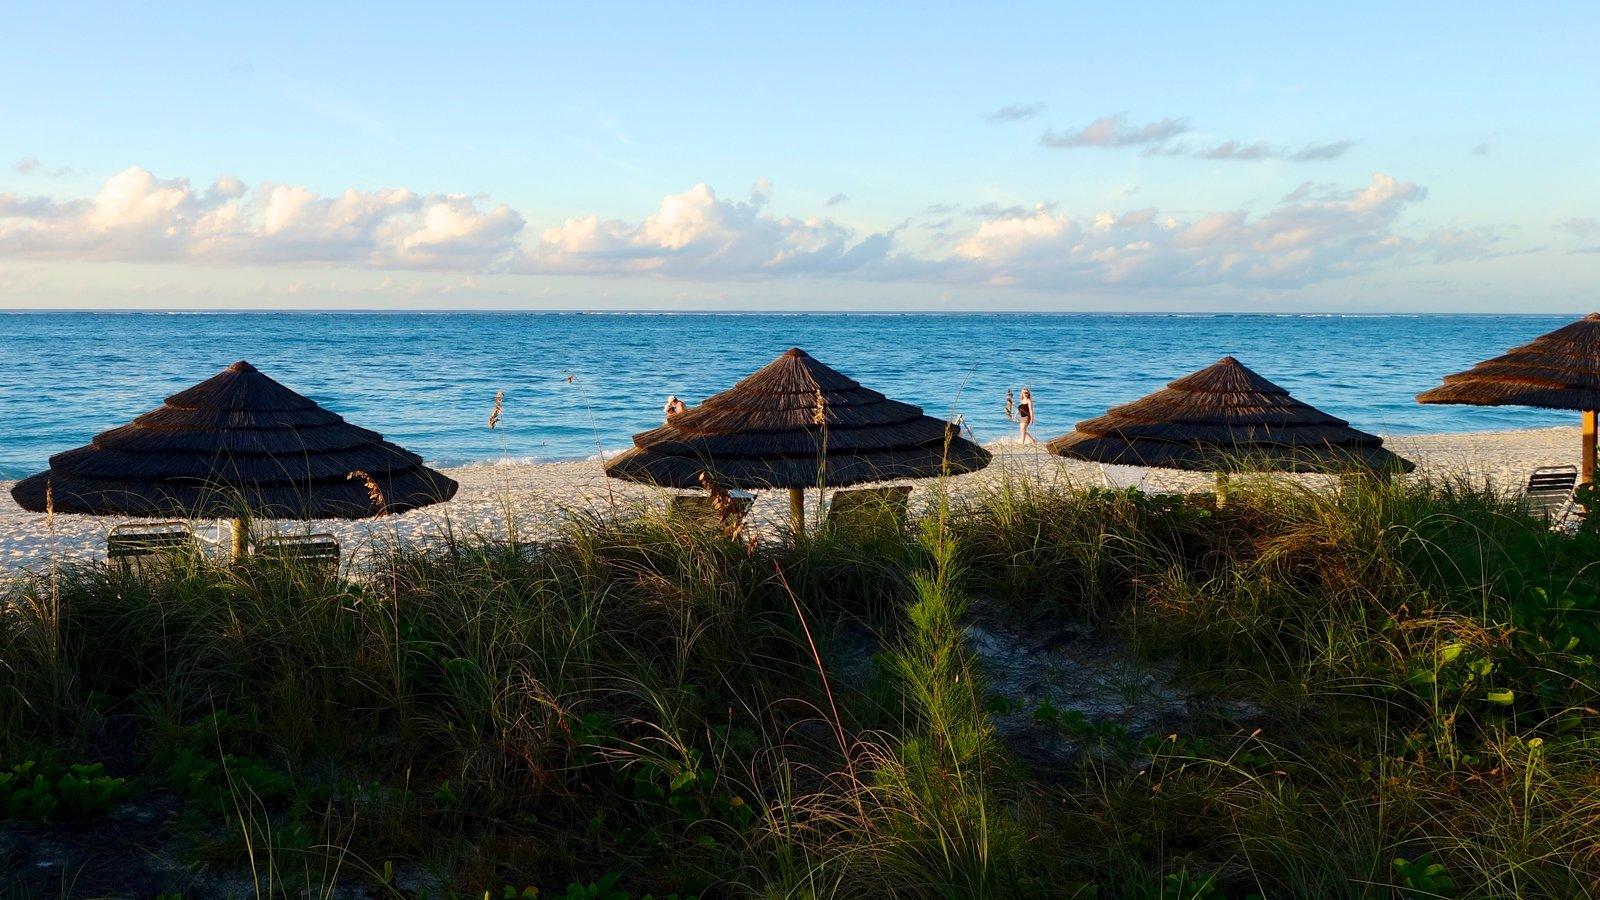 Grace Bay Beach which includes a sandy beach